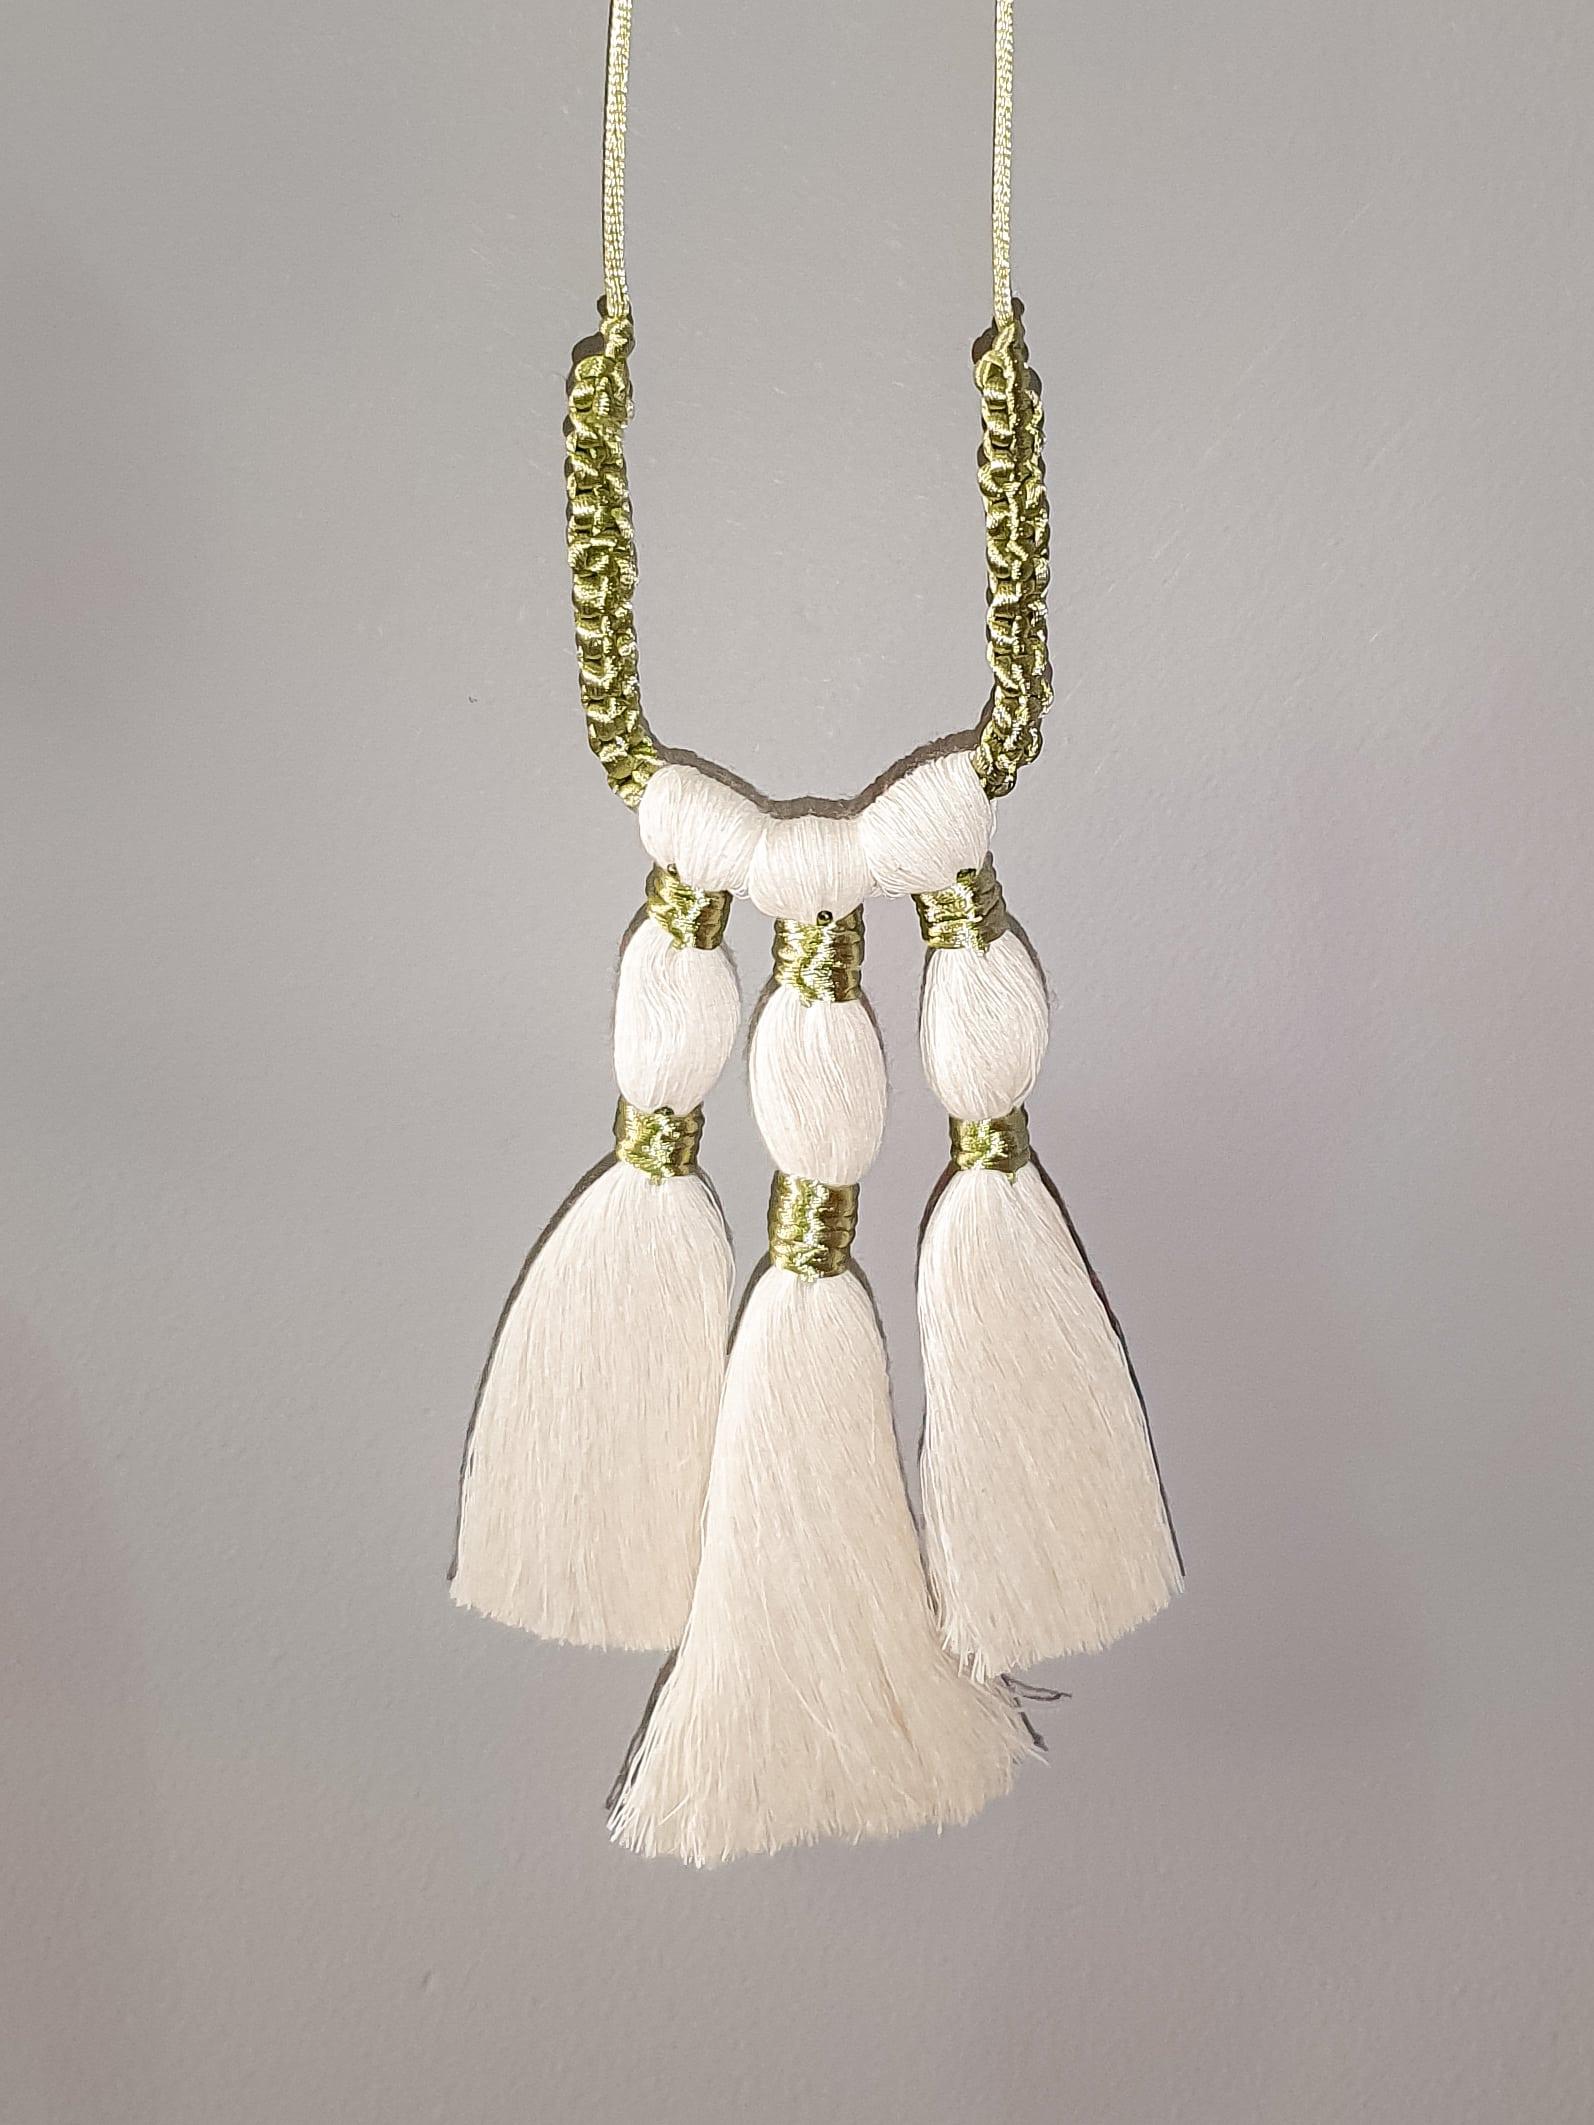 Triple Tassel Macrame Necklace by Amun Handmade Designs | Inspire Me Latin America